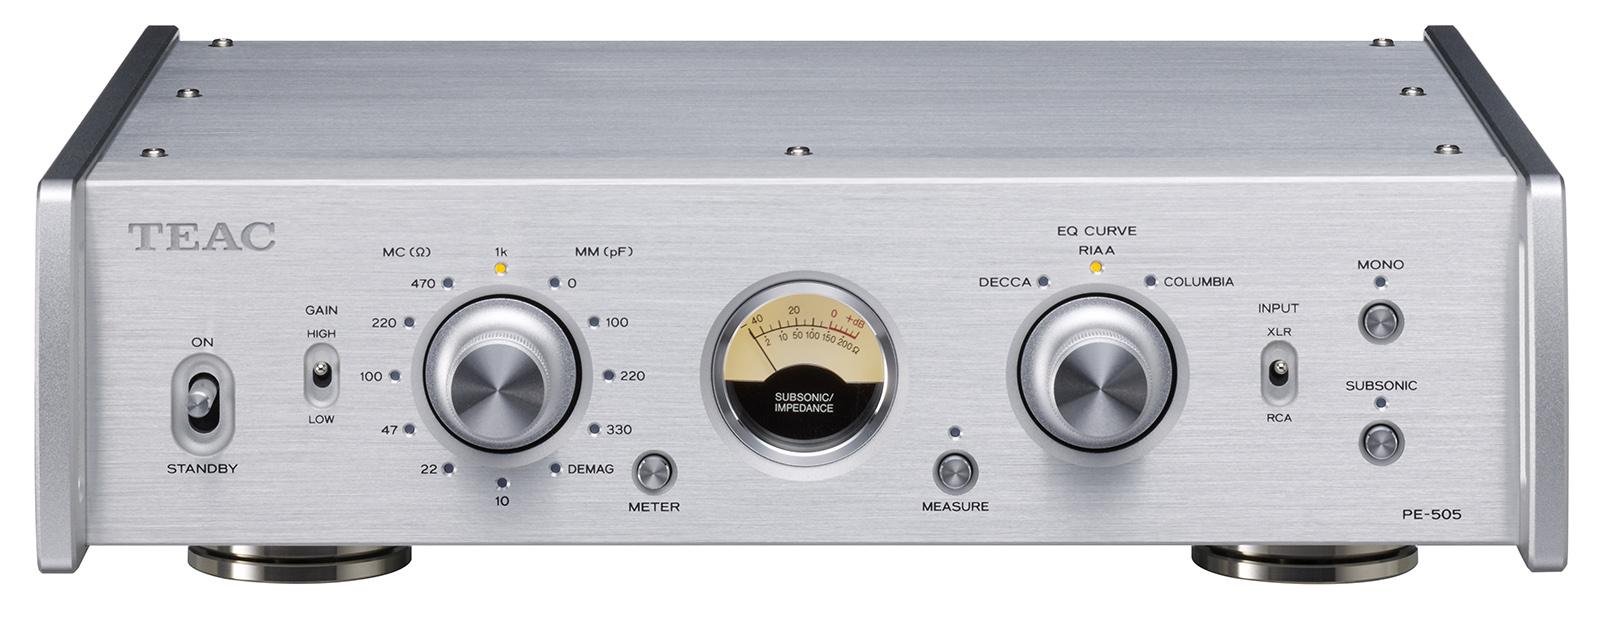 Nuevo previo de phono TEAC PE-505 Pe-505-s_front